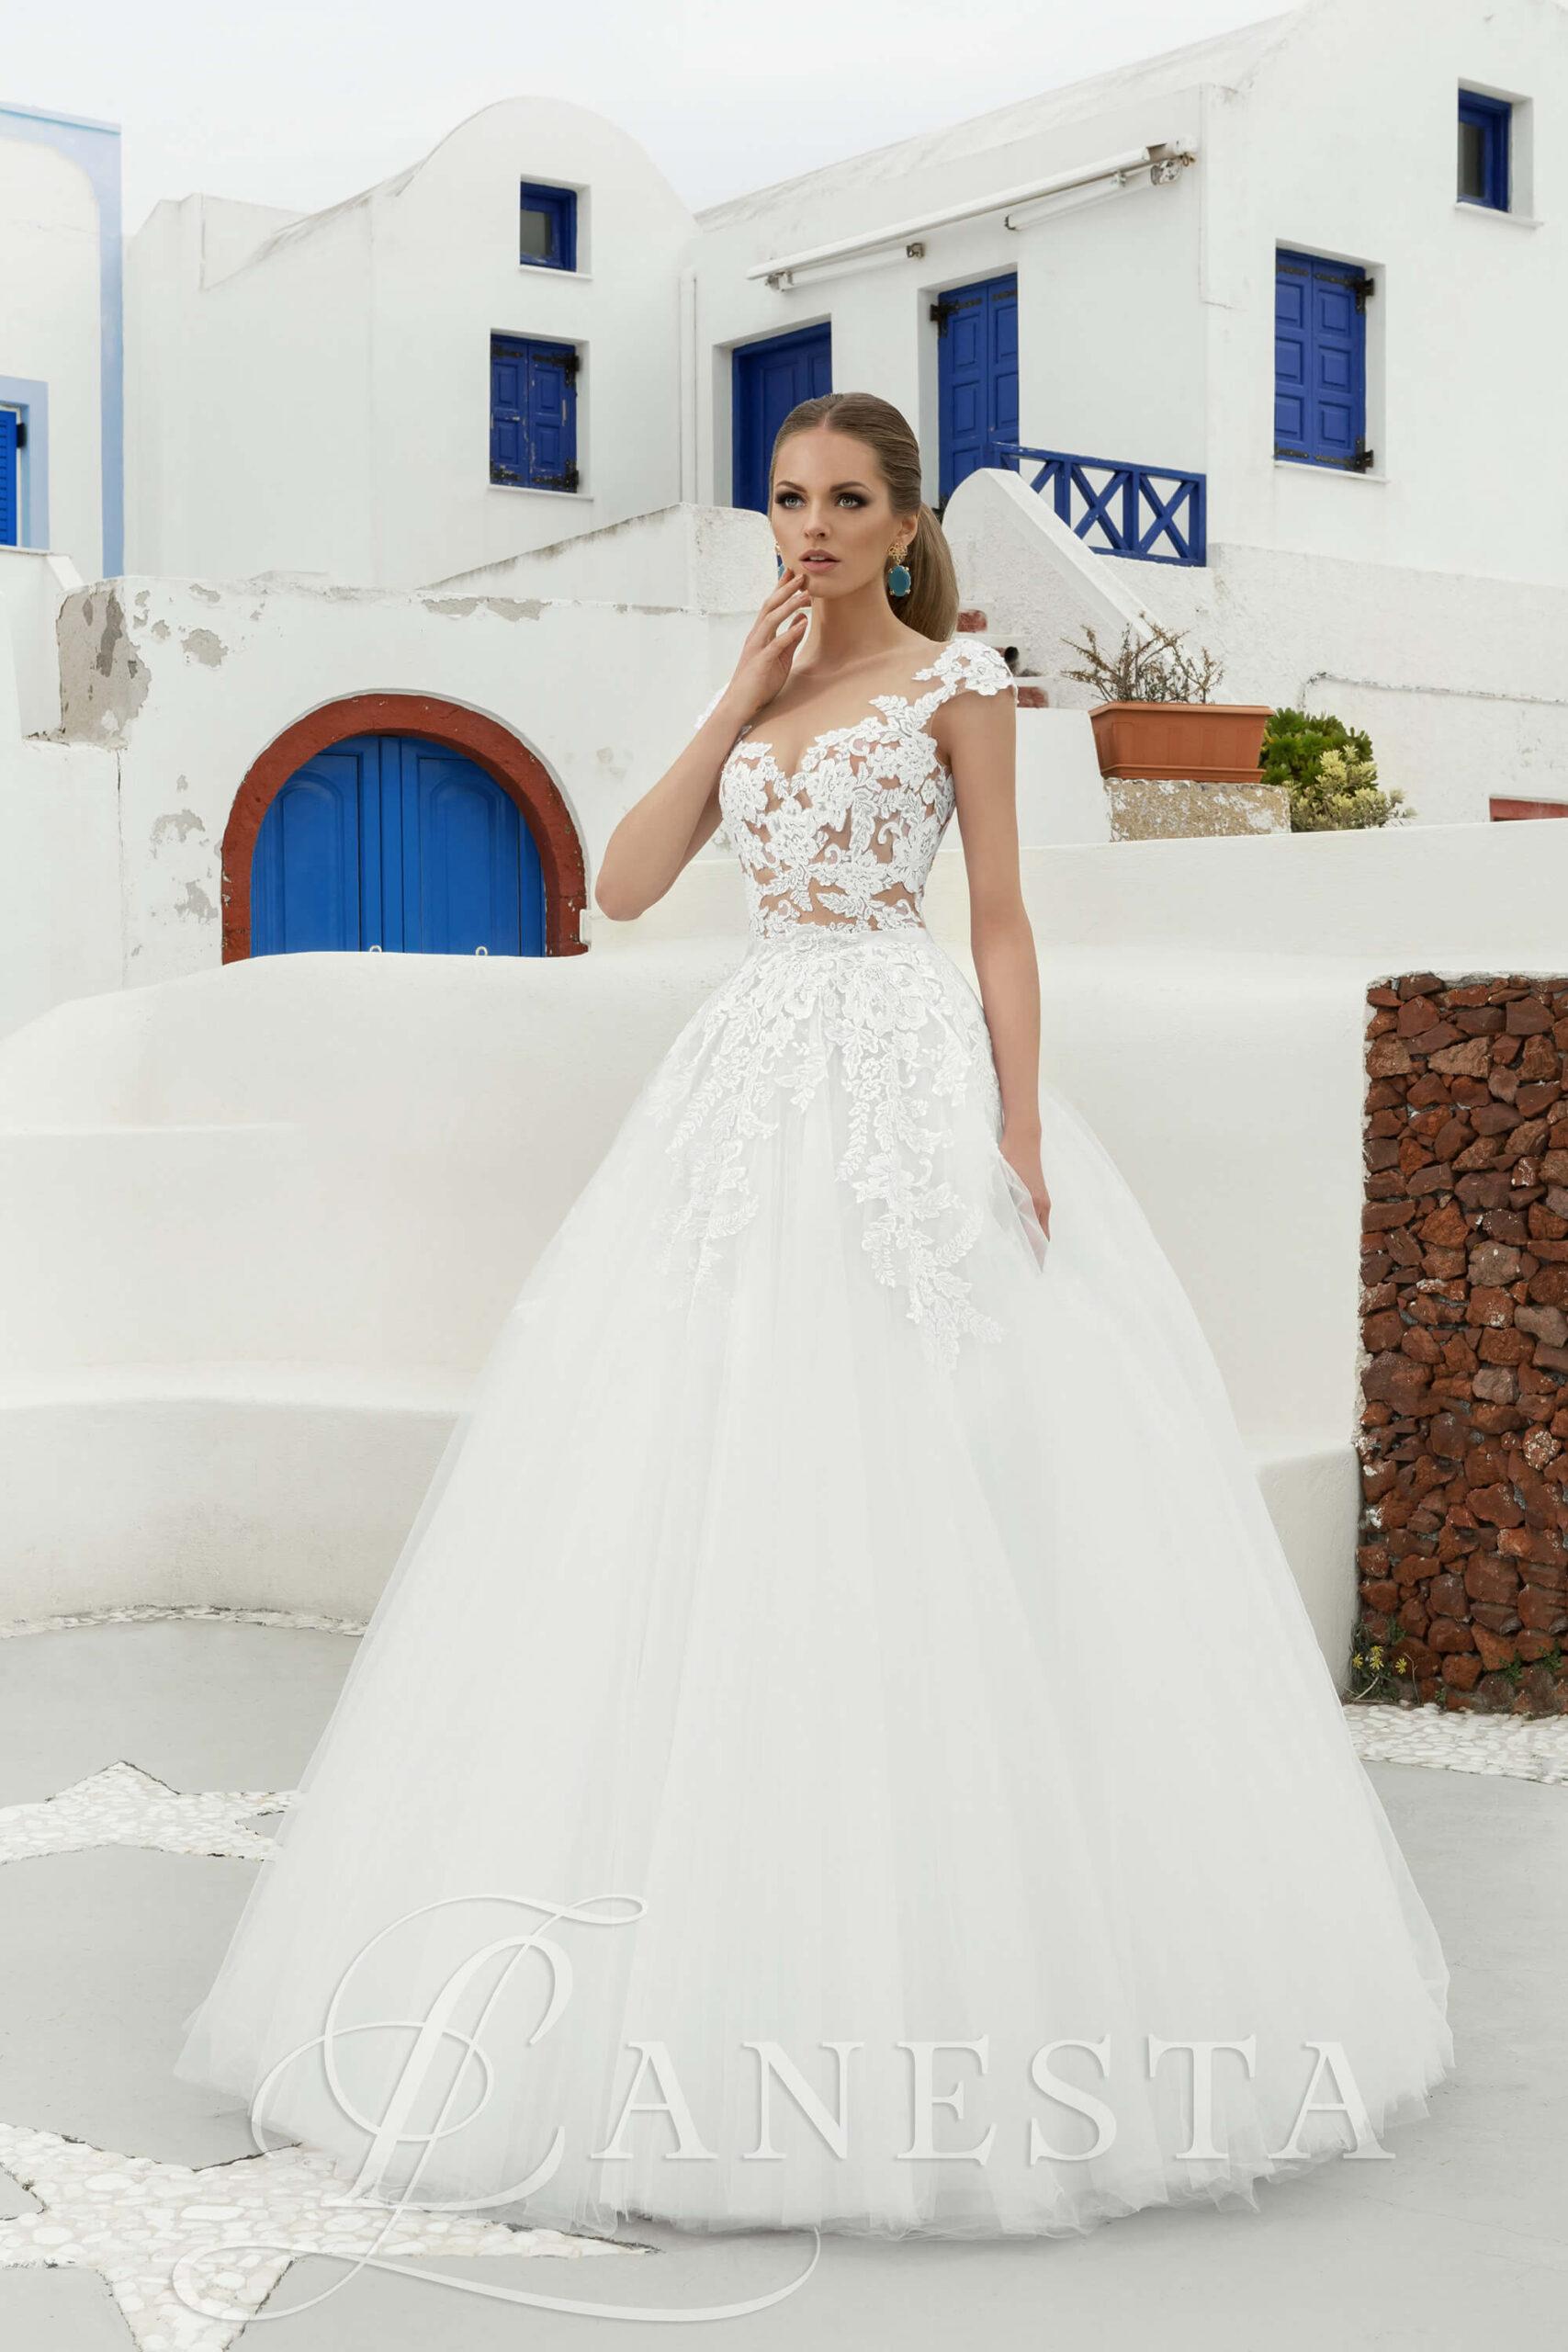 Cвадебное платье Bjanka Lanesta